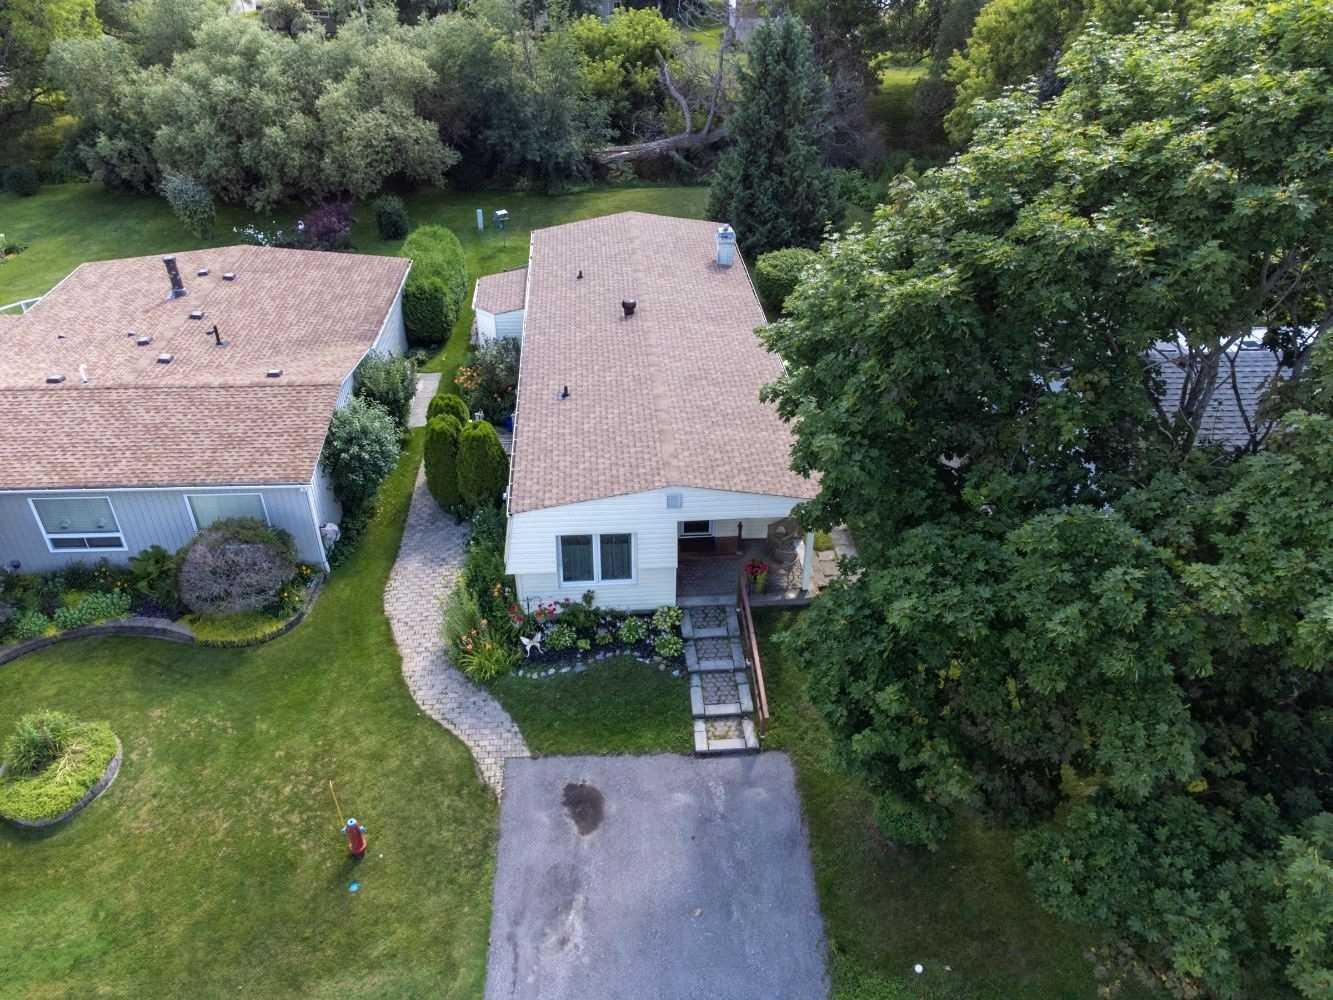 Detached house For Sale In Clarington - 15 Wheelhouse Dr, Clarington, Ontario, Canada L1B 1B9 , 2 Bedrooms Bedrooms, ,2 BathroomsBathrooms,Detached,For Sale,Wheelhouse